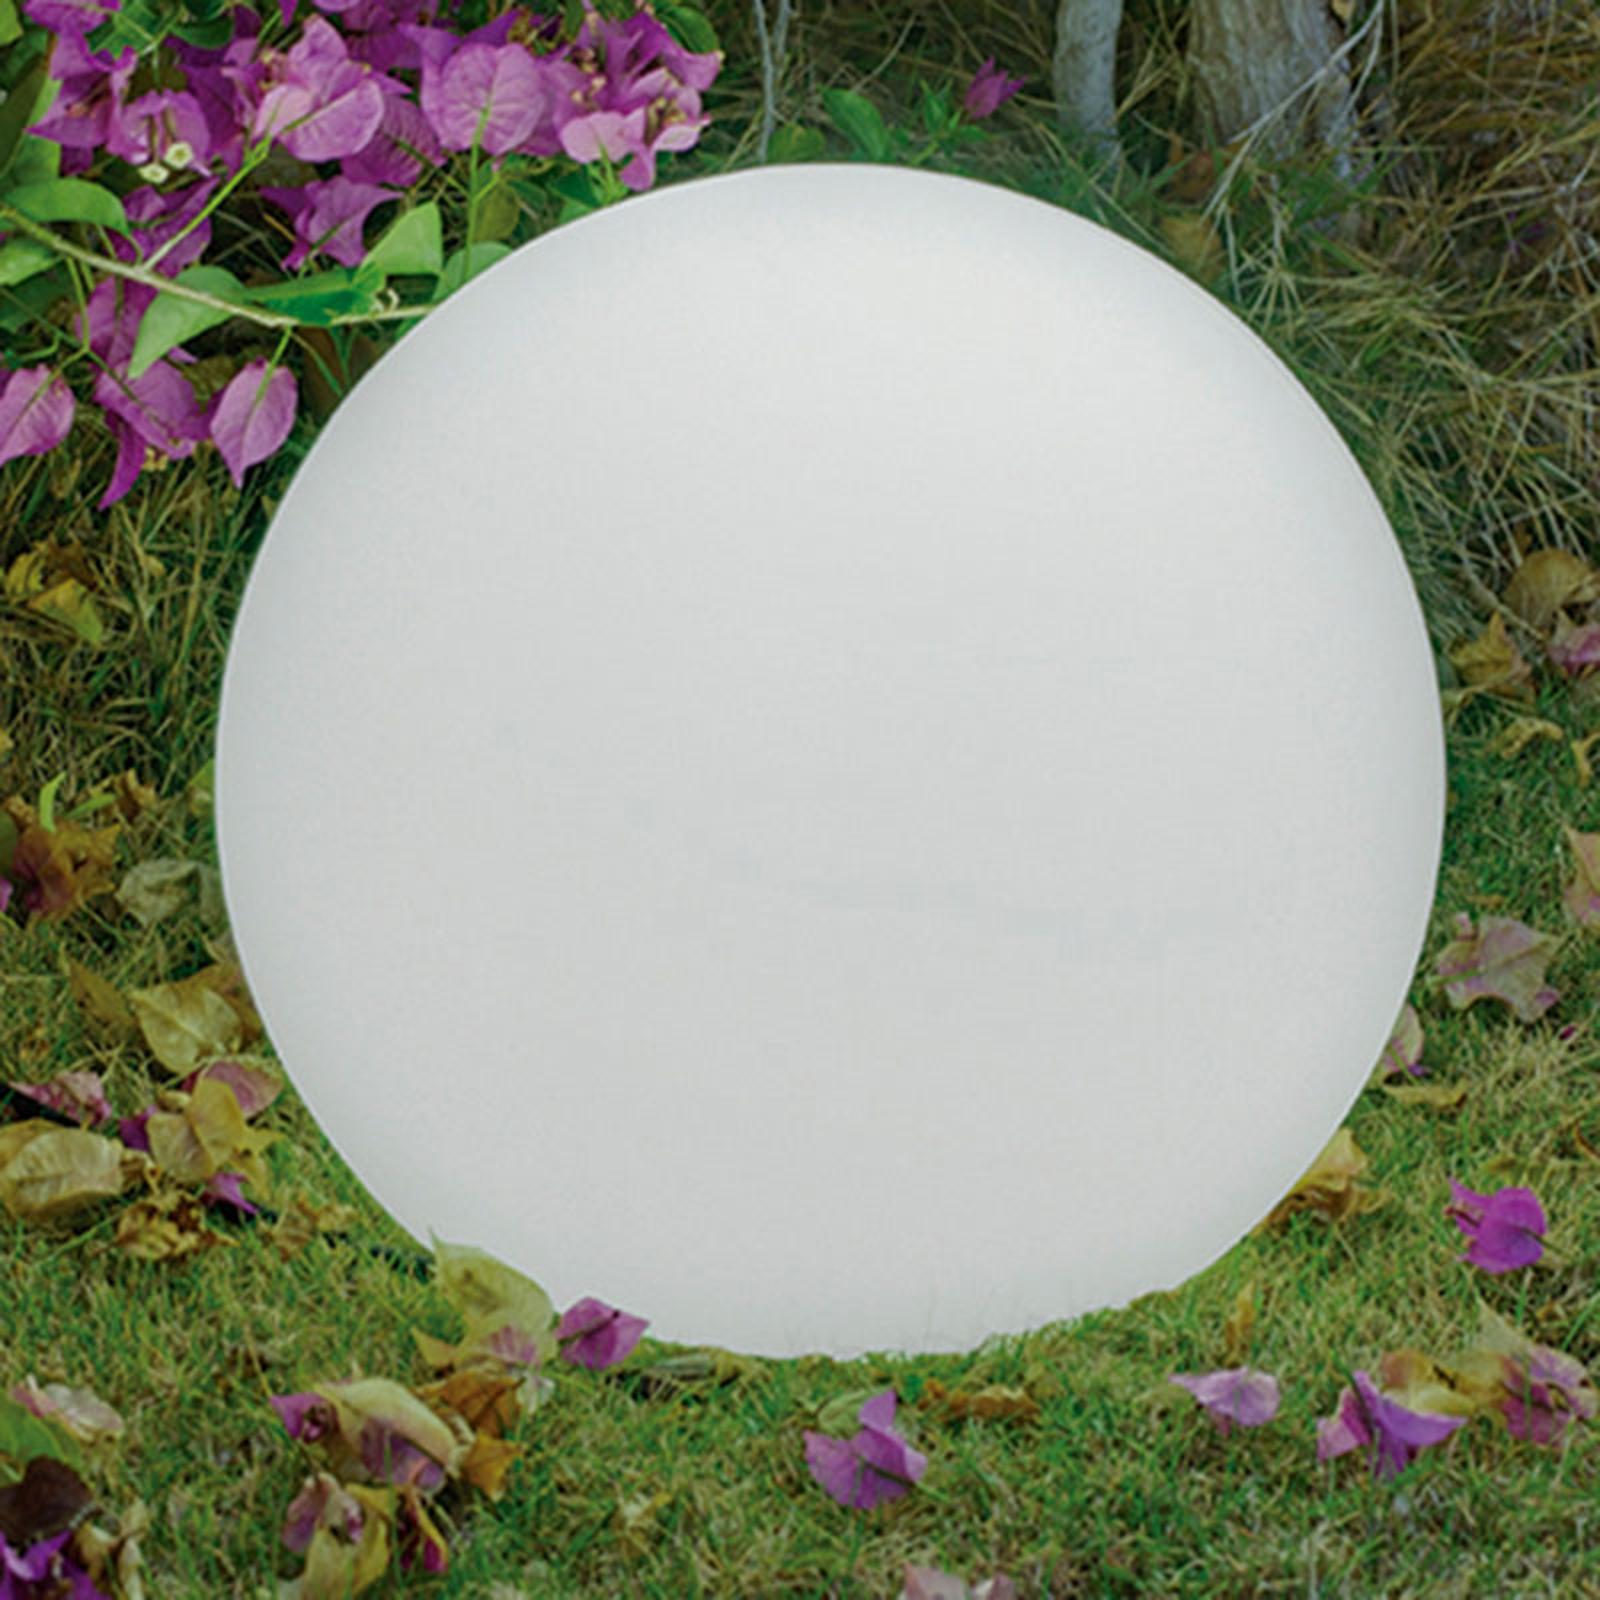 Newgarden Buly golvlampa i kulform, Ø 40 cm